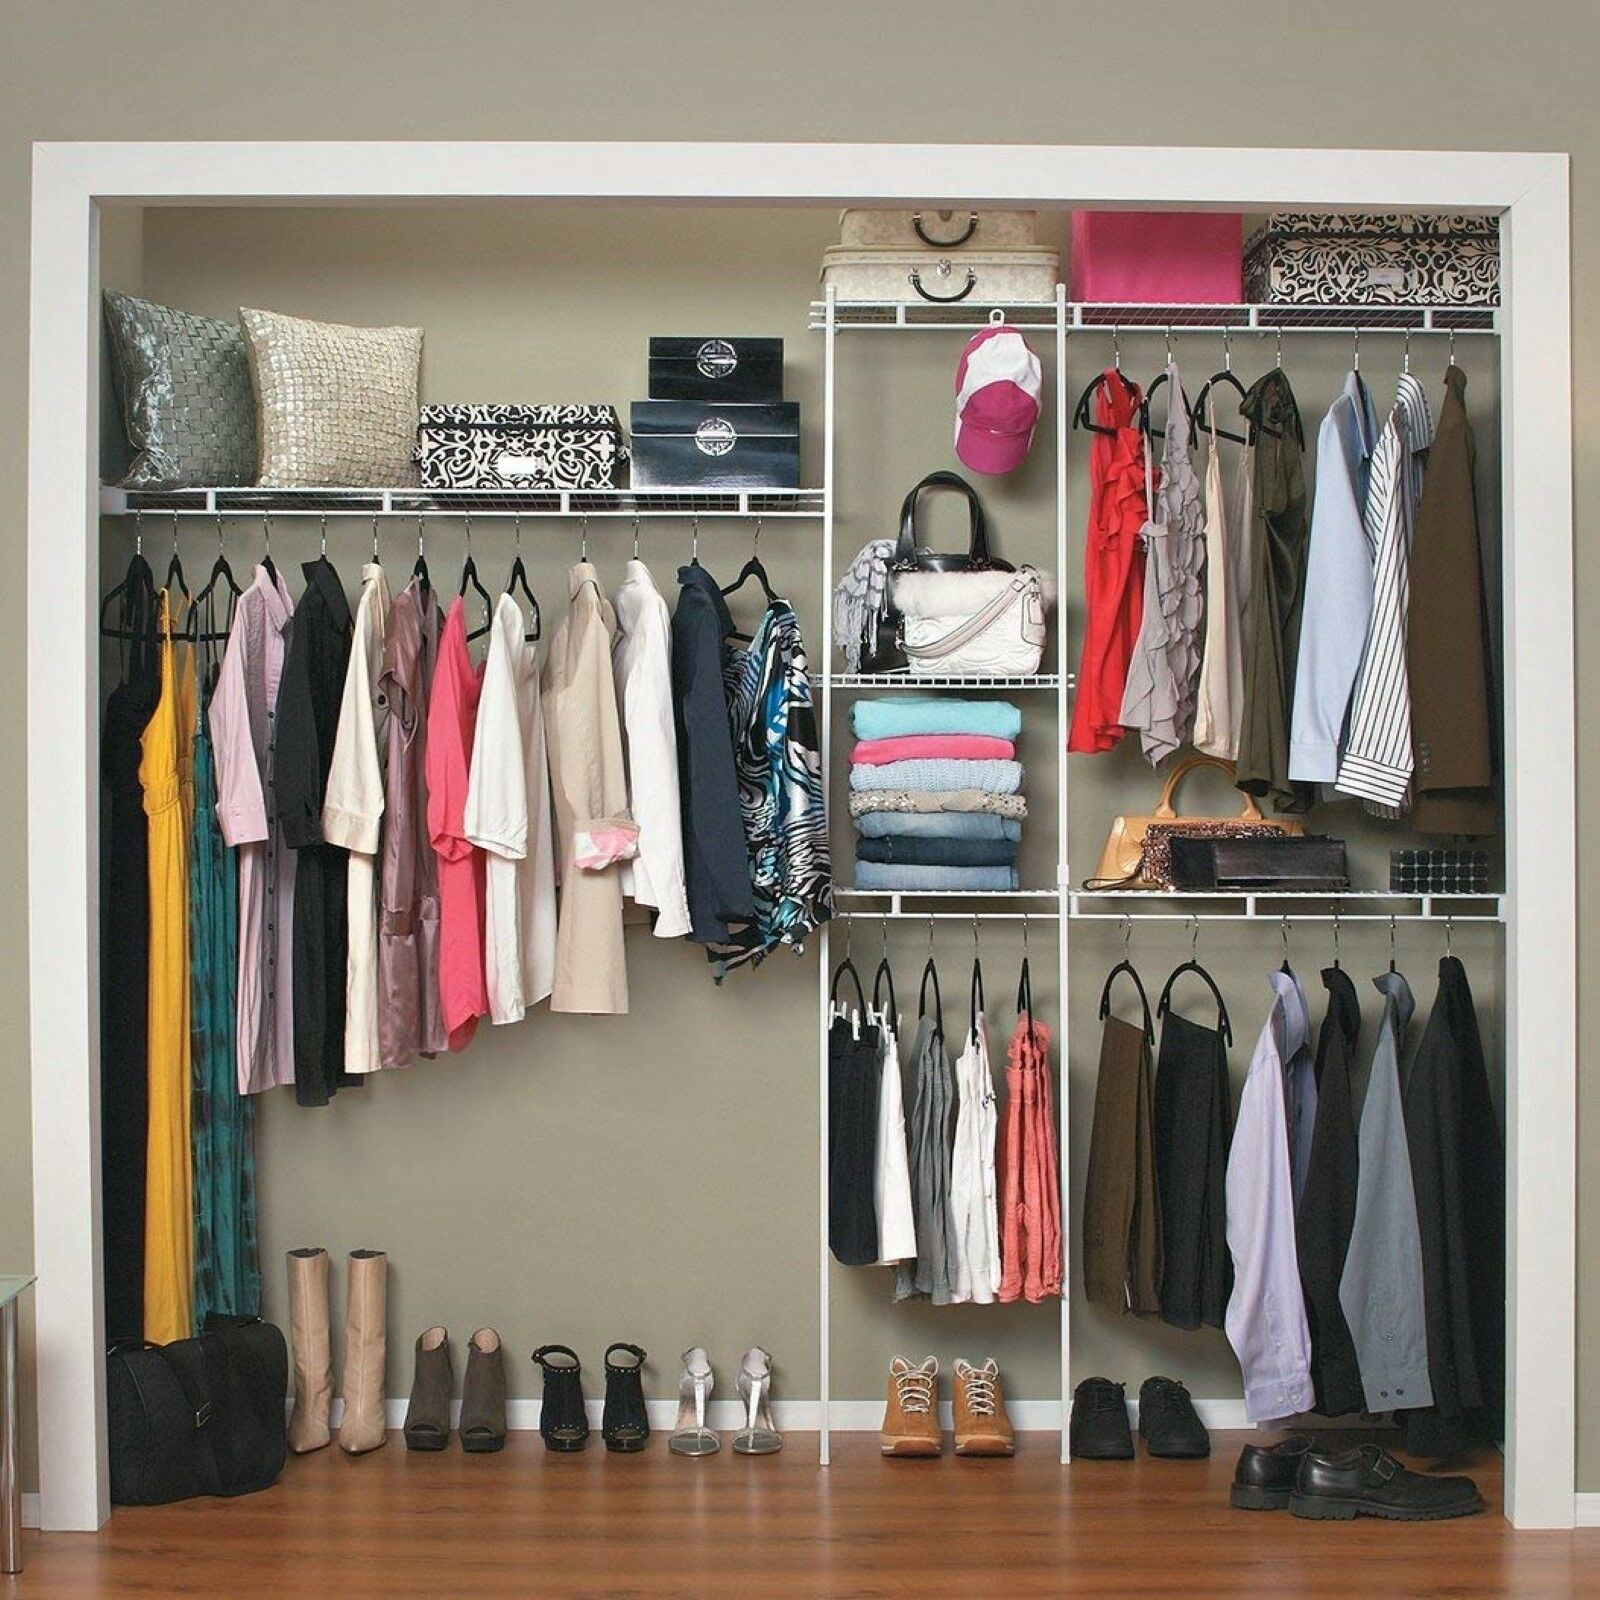 ClosetMaid 1628 Closet Organizer Kit, 5-Foot to 8-Foot, Whit